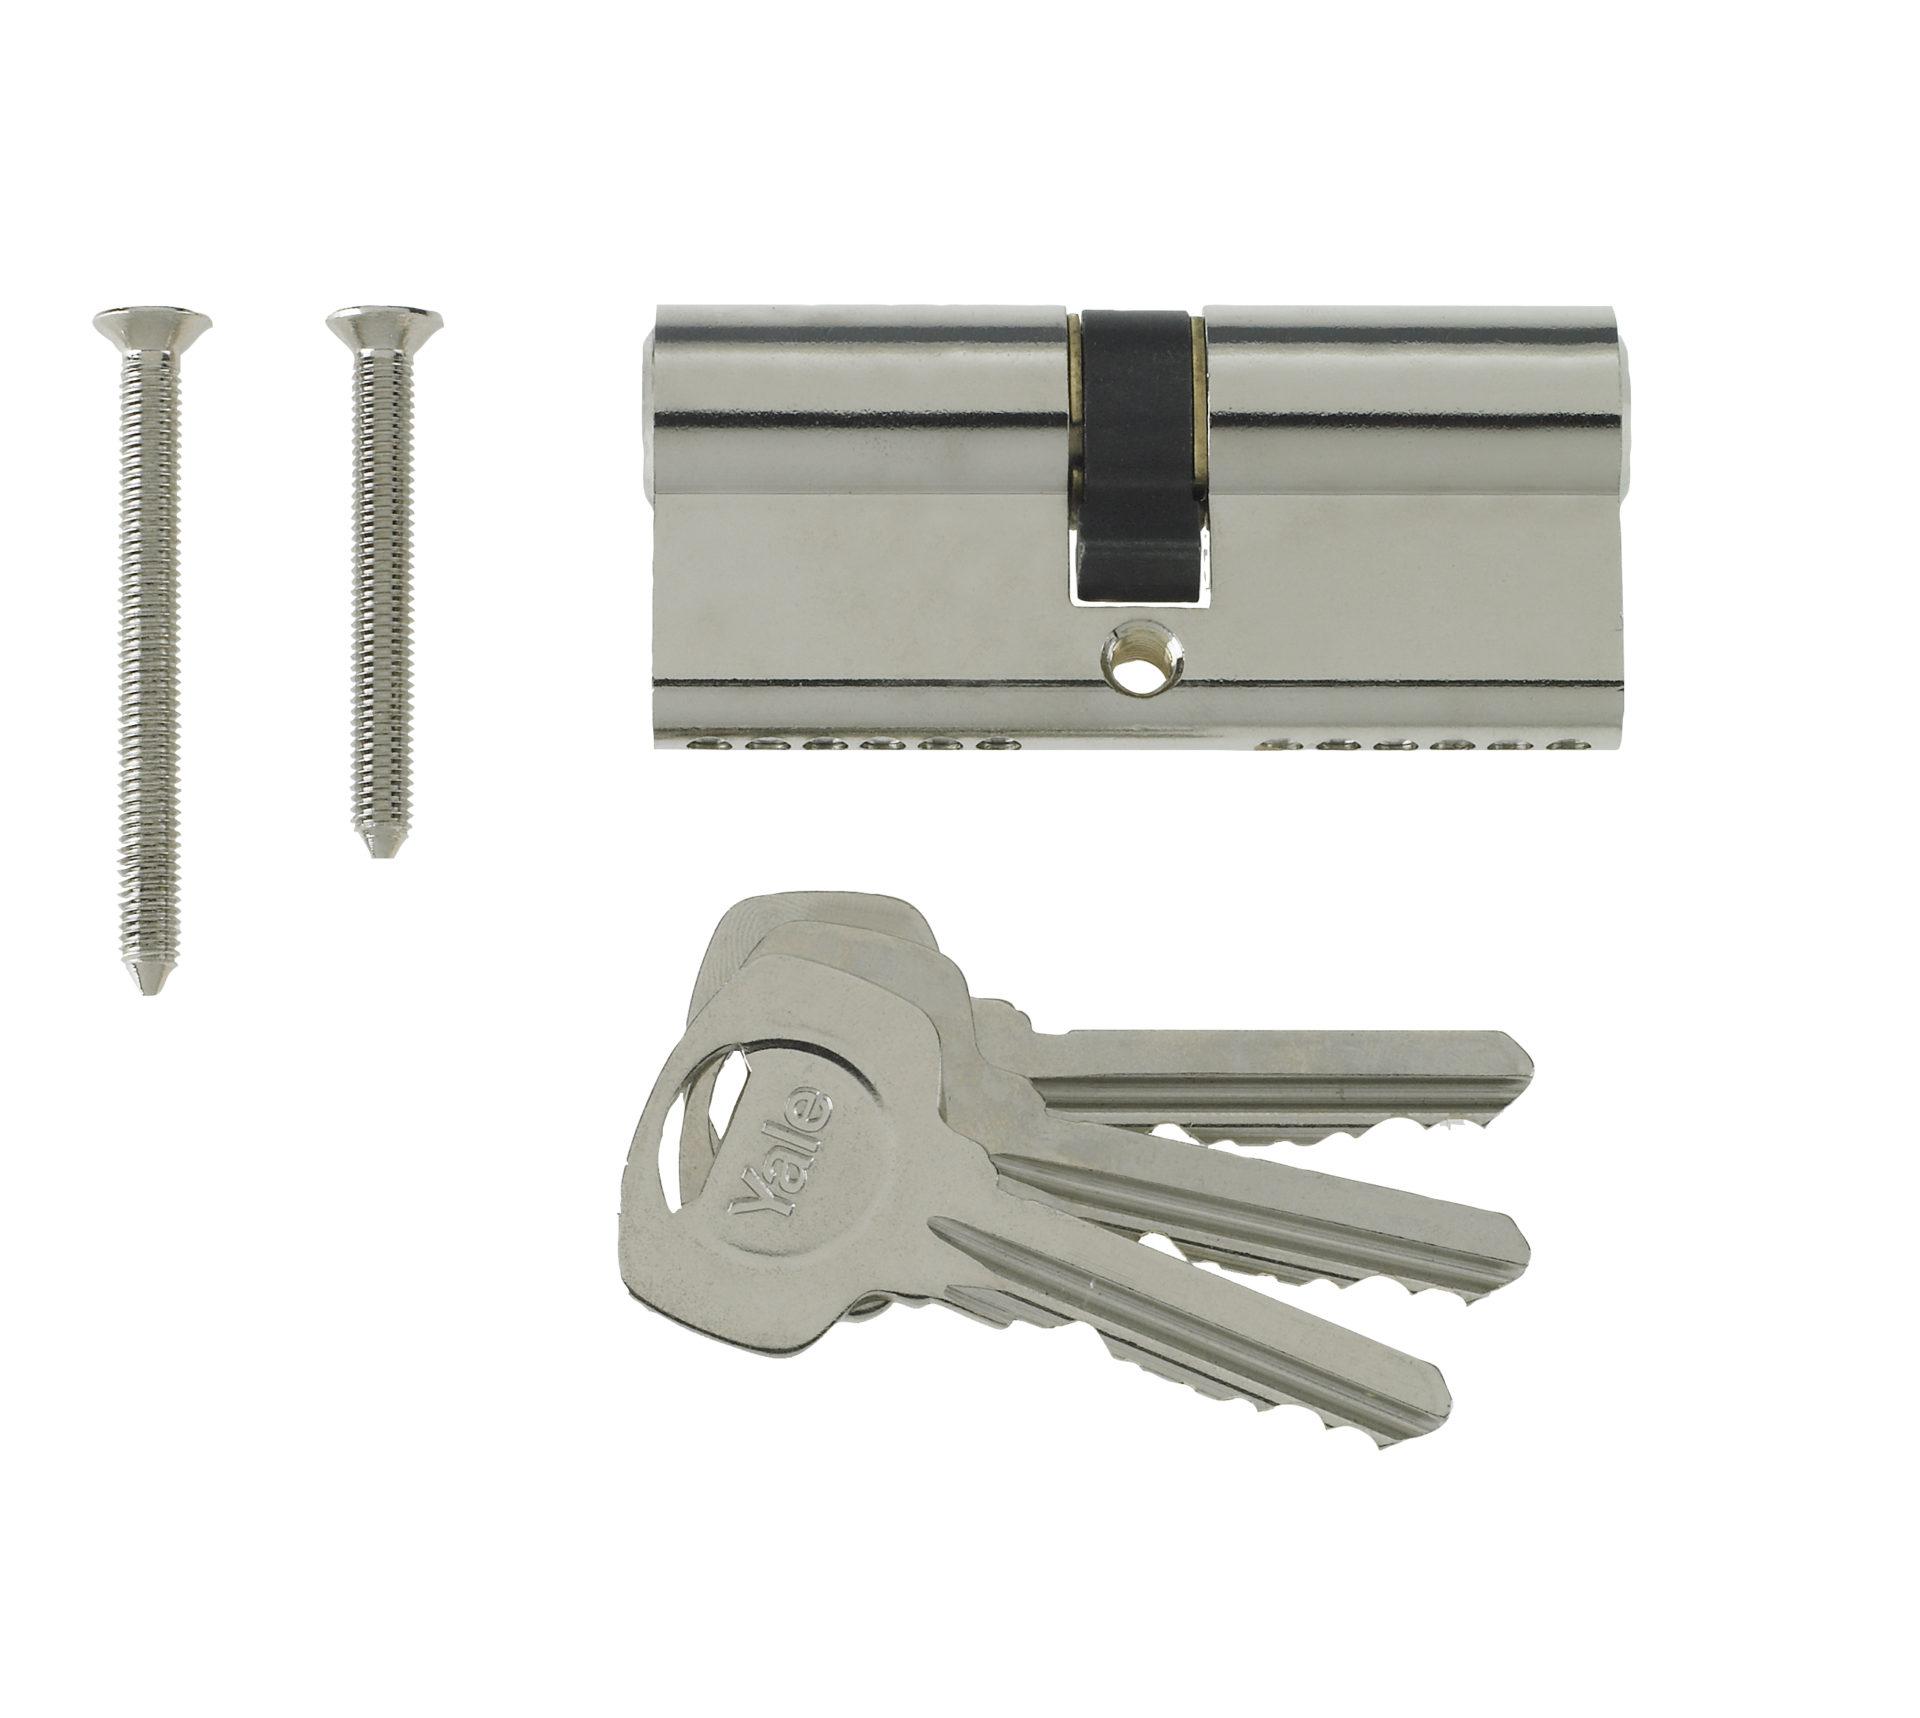 Yale 6 Pin Euro Profile Cylinder Lock Nickle 40/60 (100mm) C/w 3 Keys